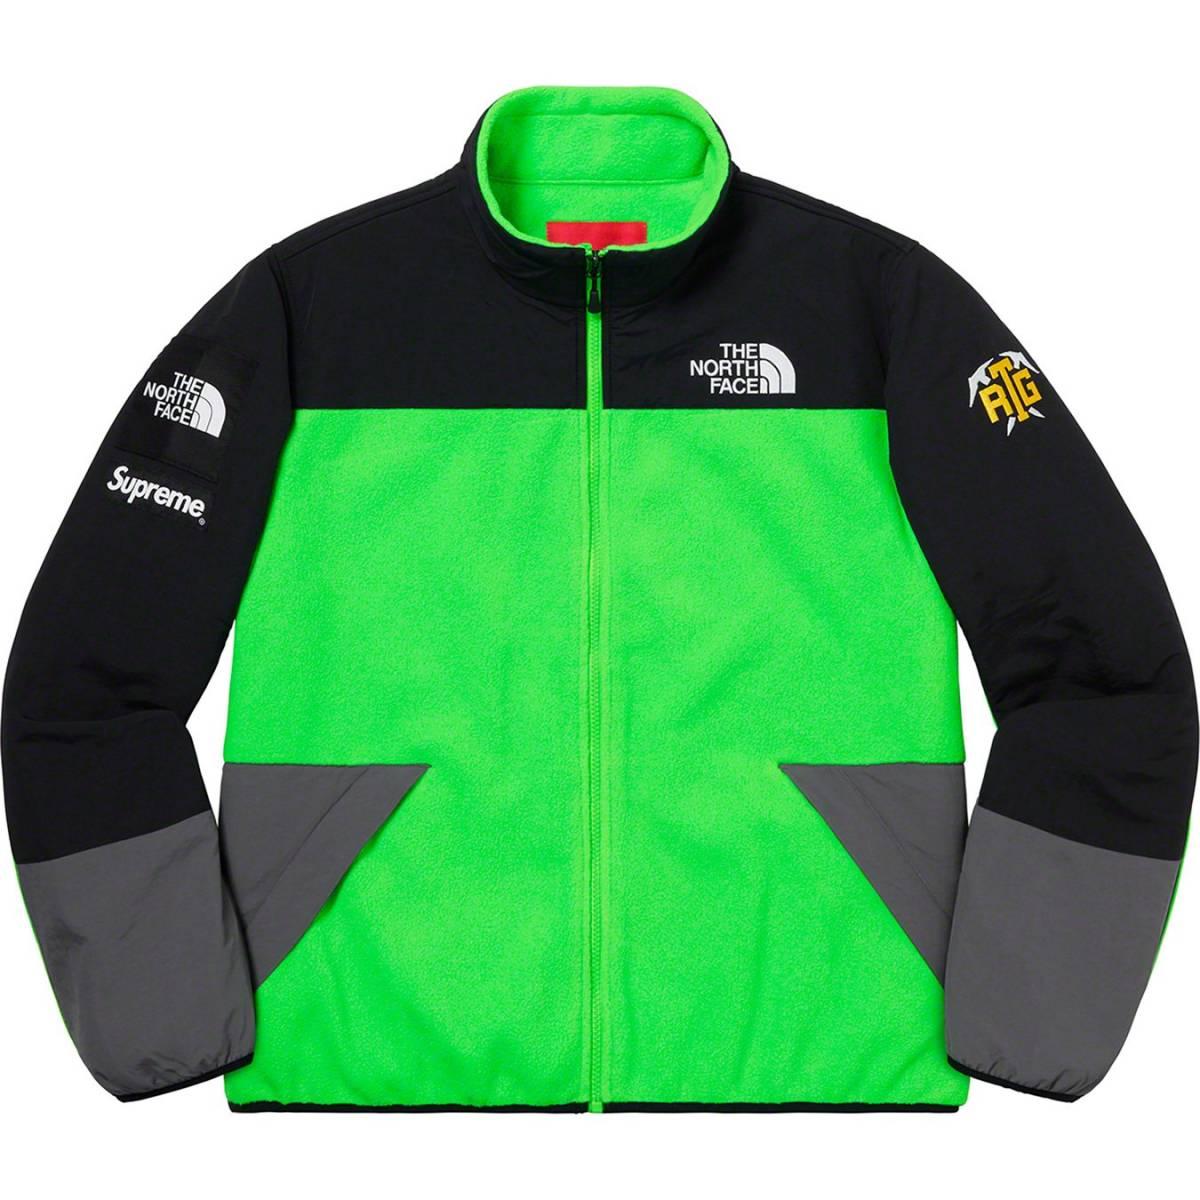 Supreme The North Face RTG Fleece Jacket 緑 BrightGreen Sサイズ 国内正規購入 タグ有 シュプリーム ノースフェイス フリースジャケット_画像5